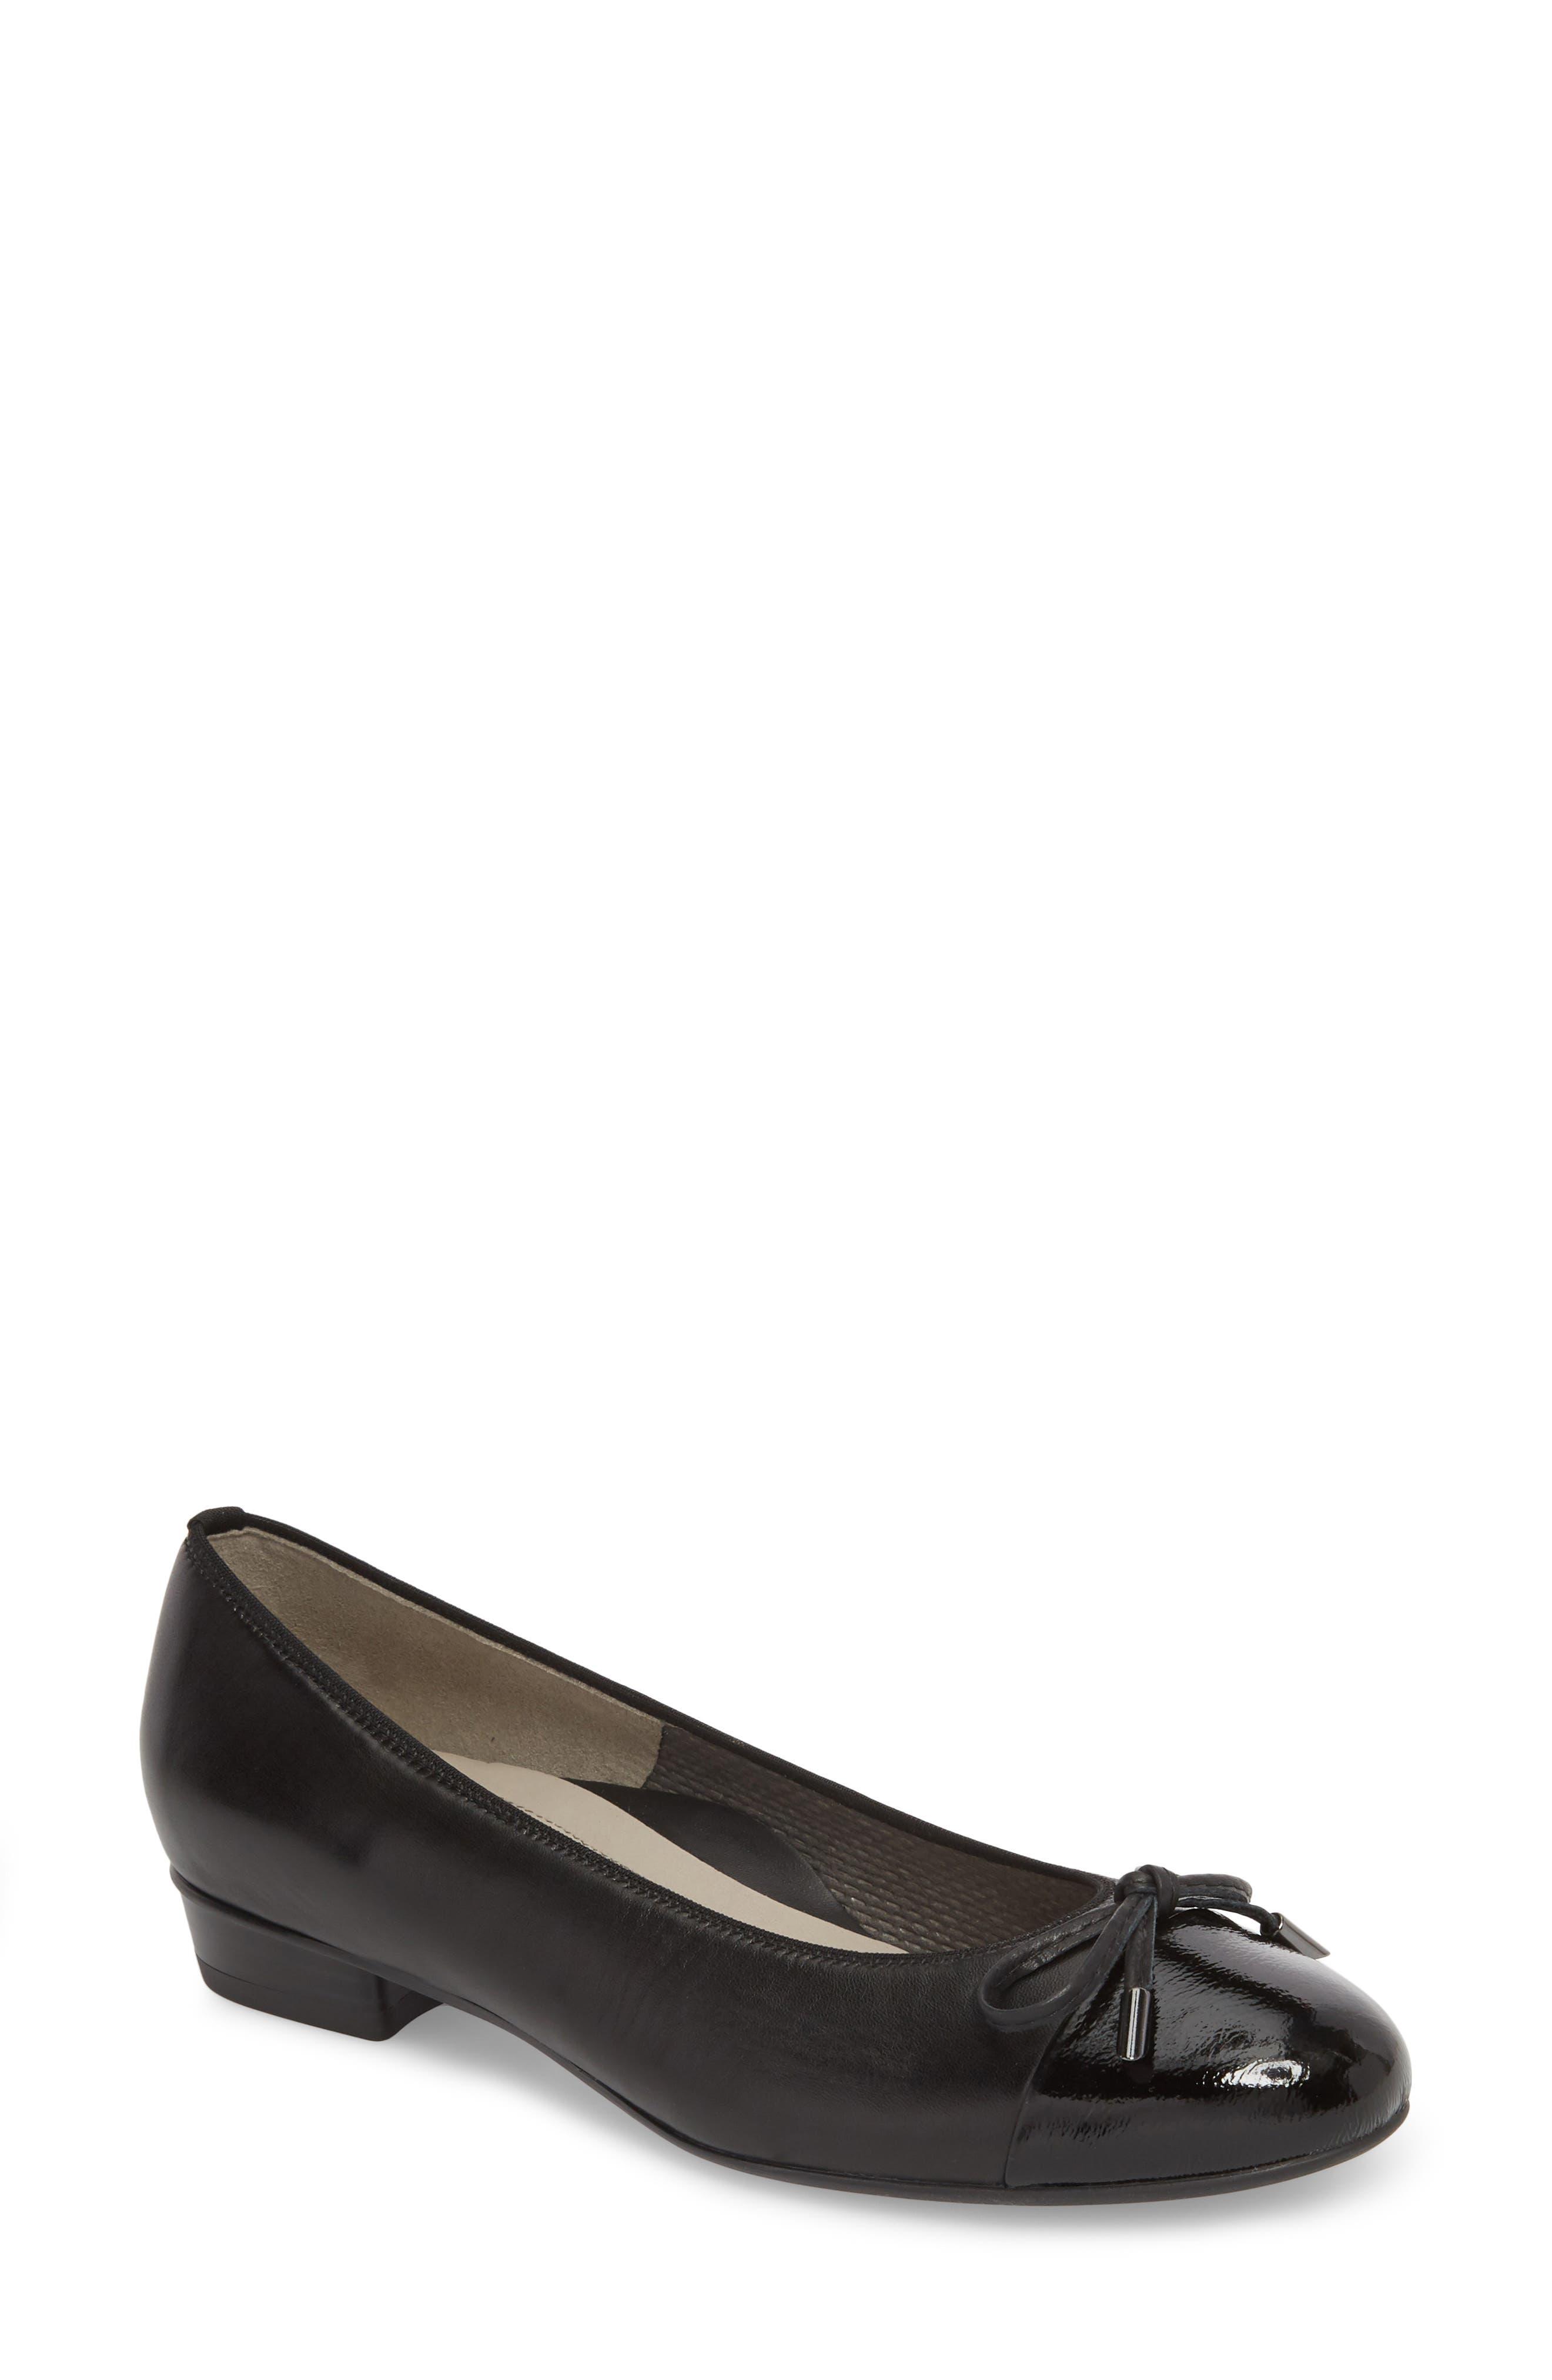 'Betty' Cap Toe Flat,                         Main,                         color, BLACK/ BLACK LEATHER